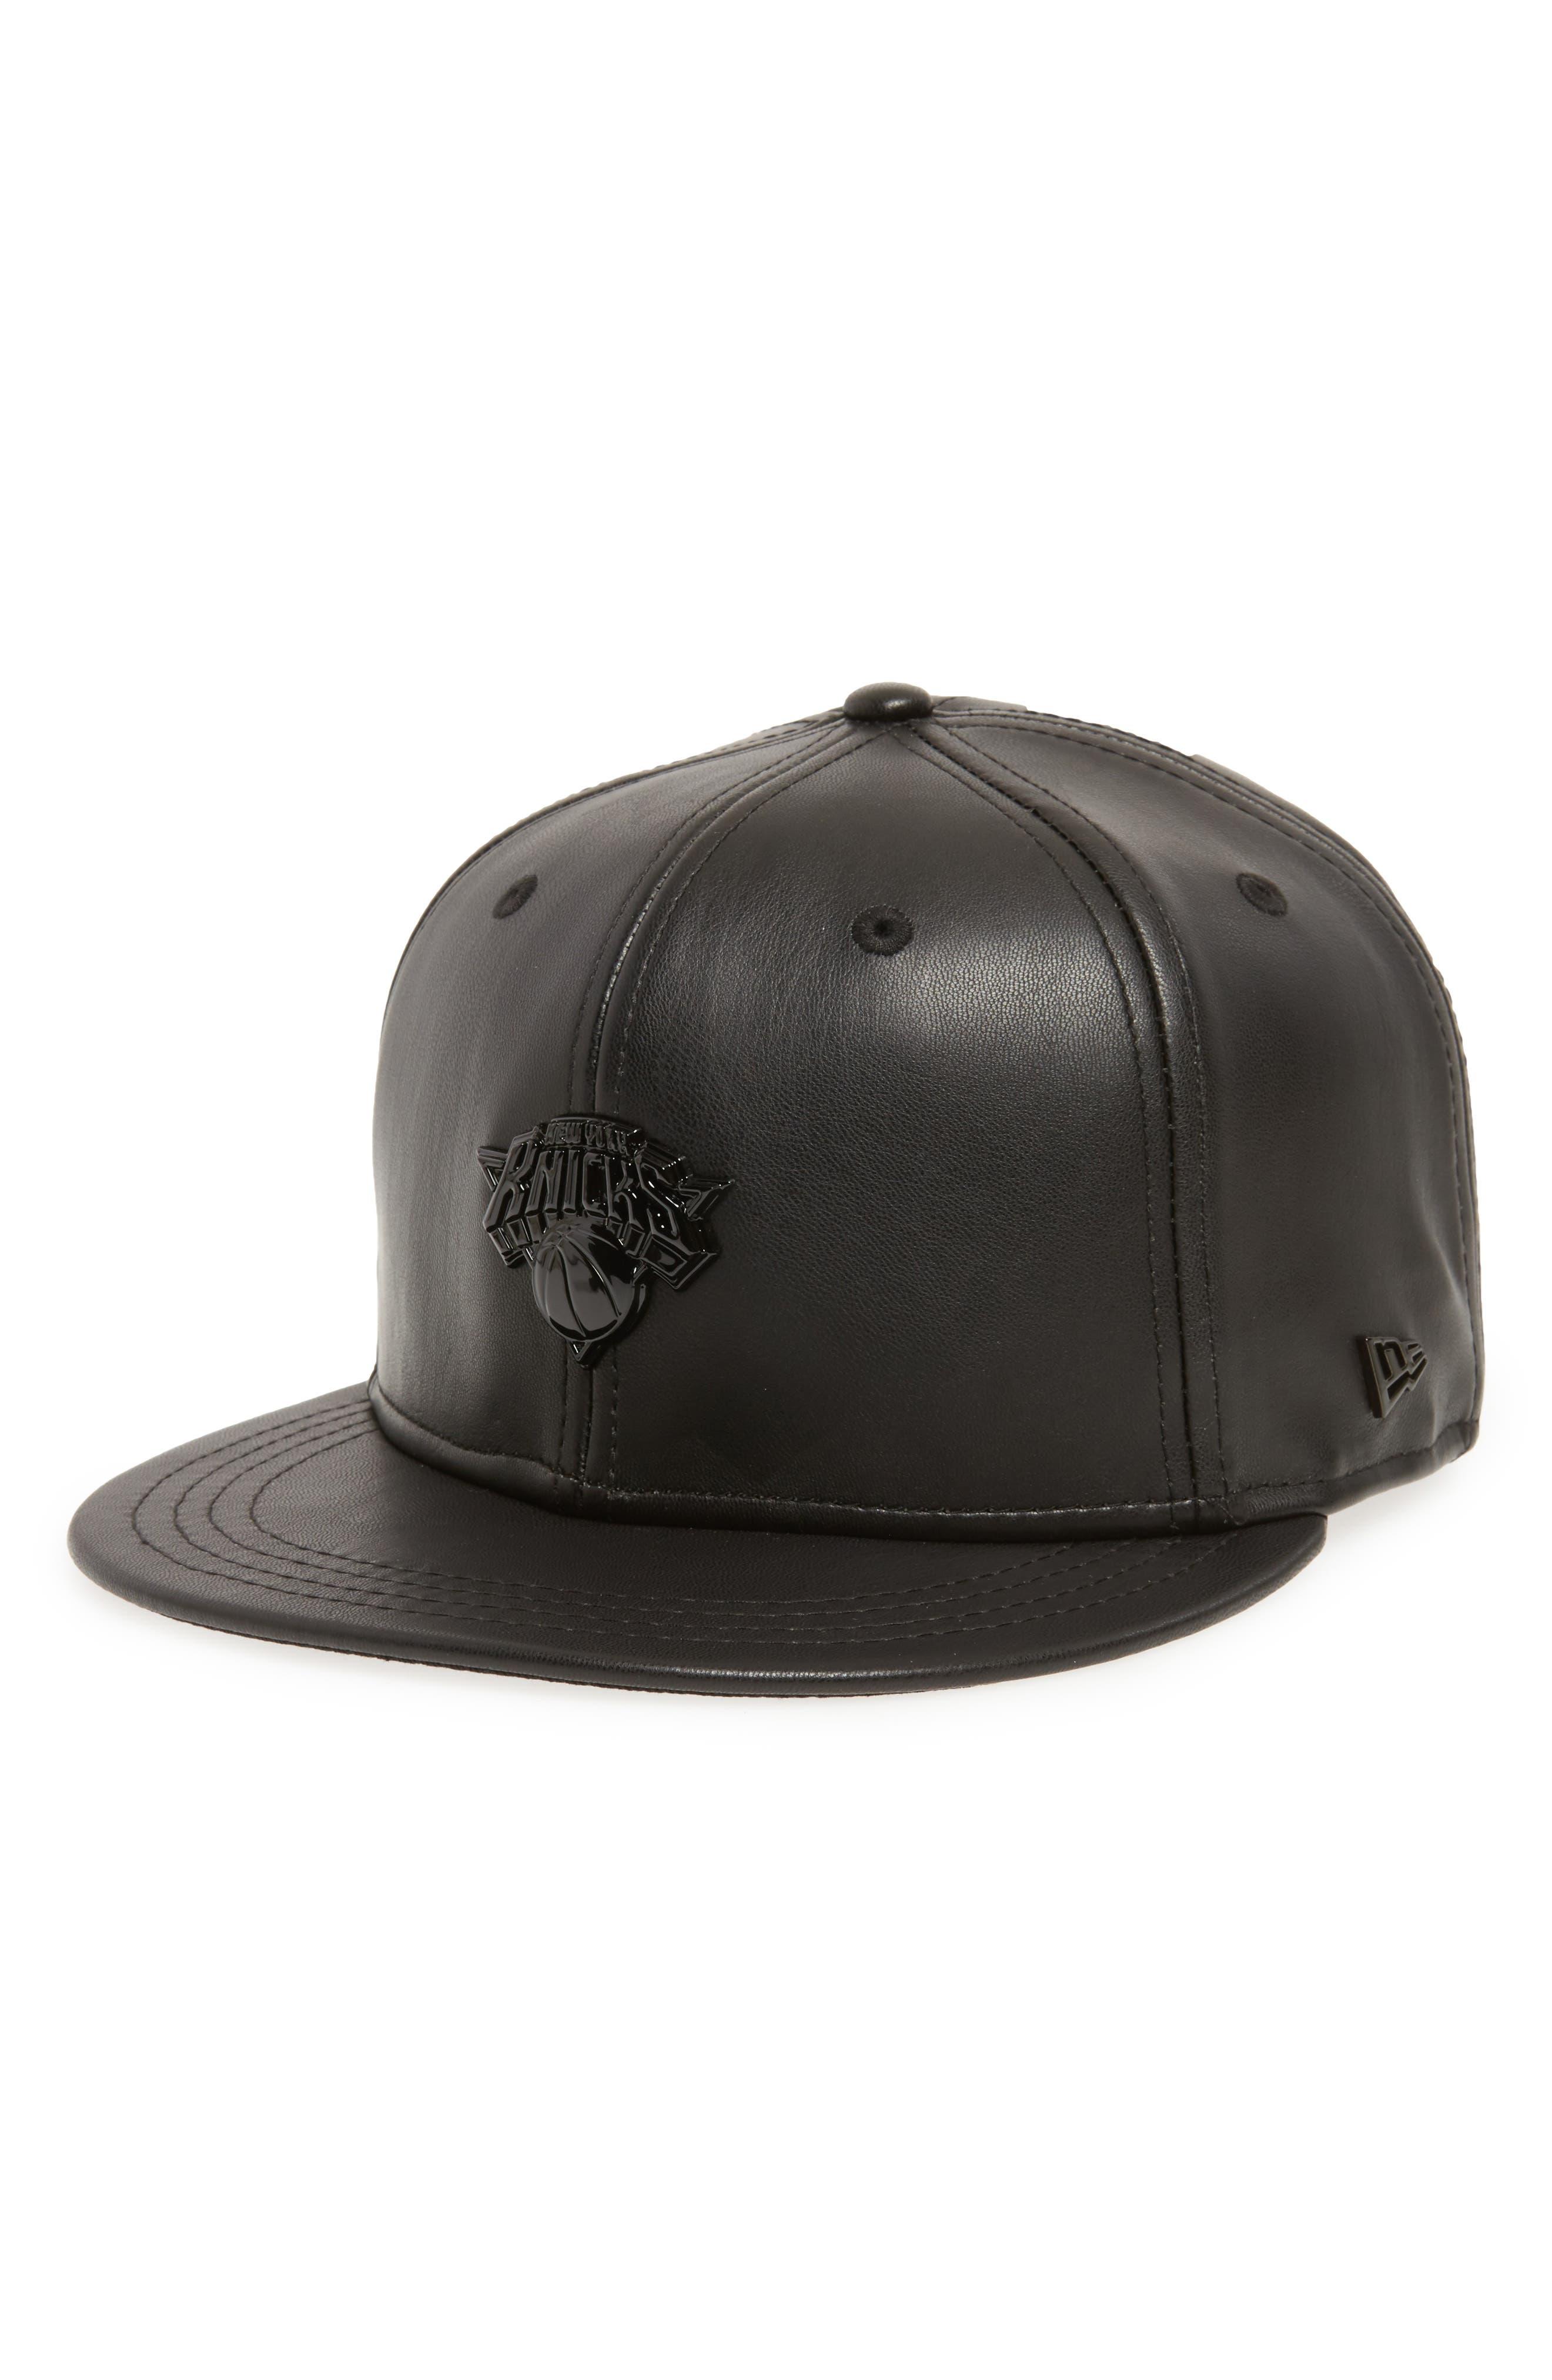 Main Image - New Era NBA Glossy Faux Leather Snapback Cap